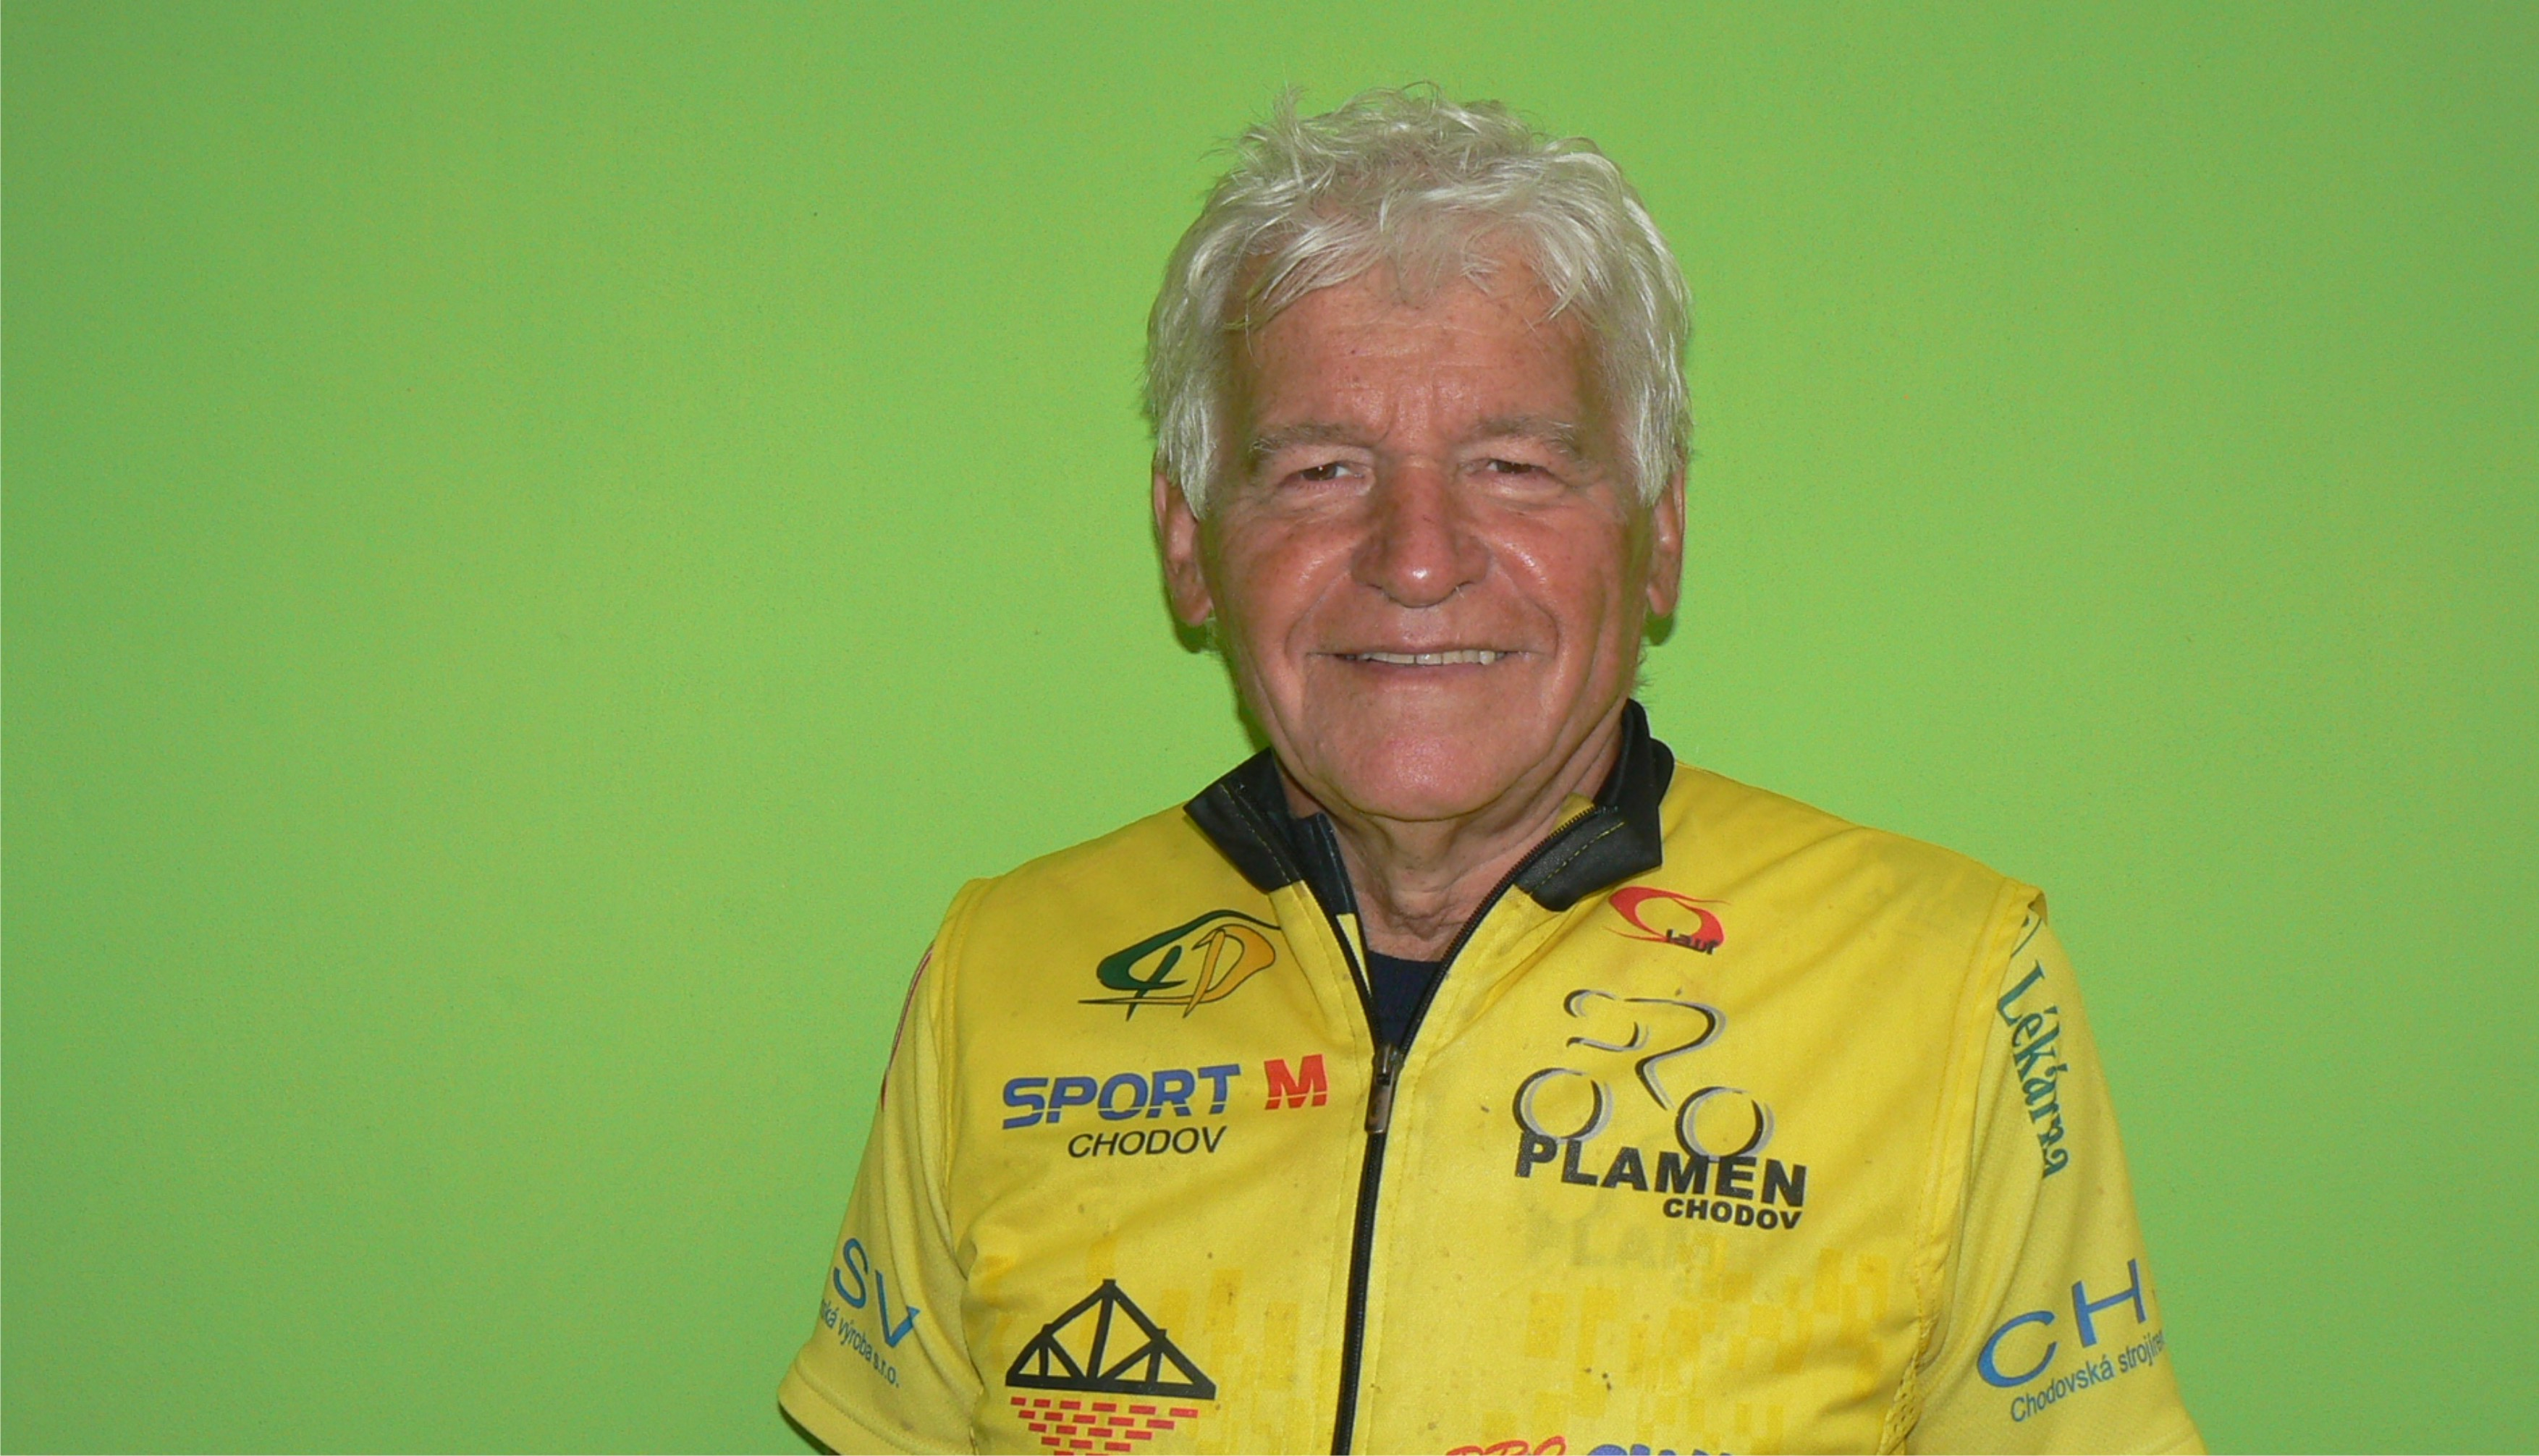 Bohuslav Václavek